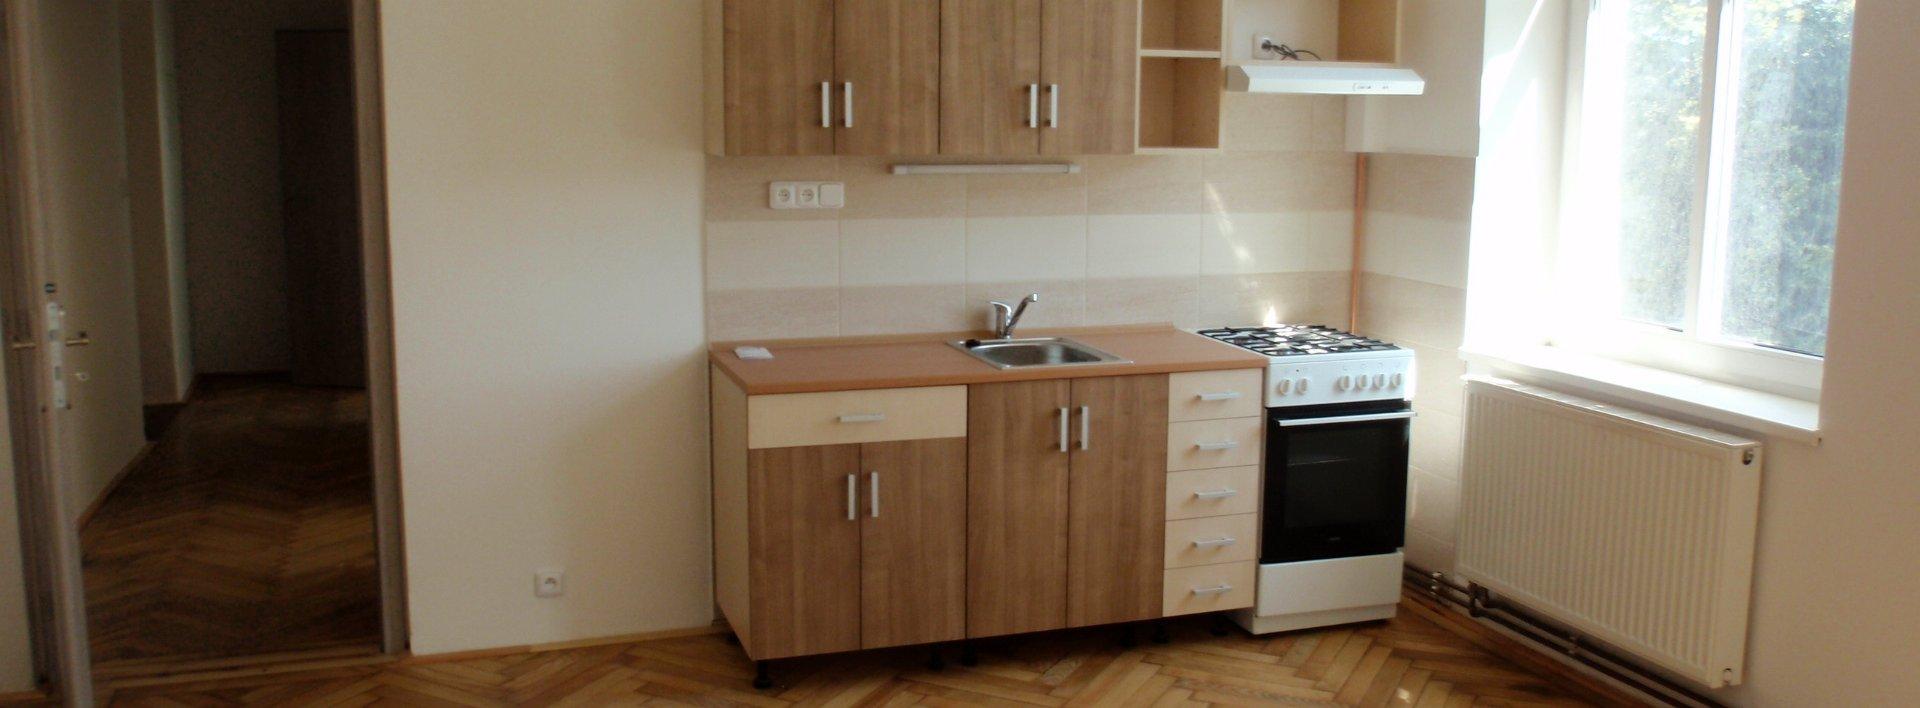 Pronájem bytu 3+kk, 66 m² - Slavíčkova, Liberec III-Jeřáb, Ev.č.: N49062